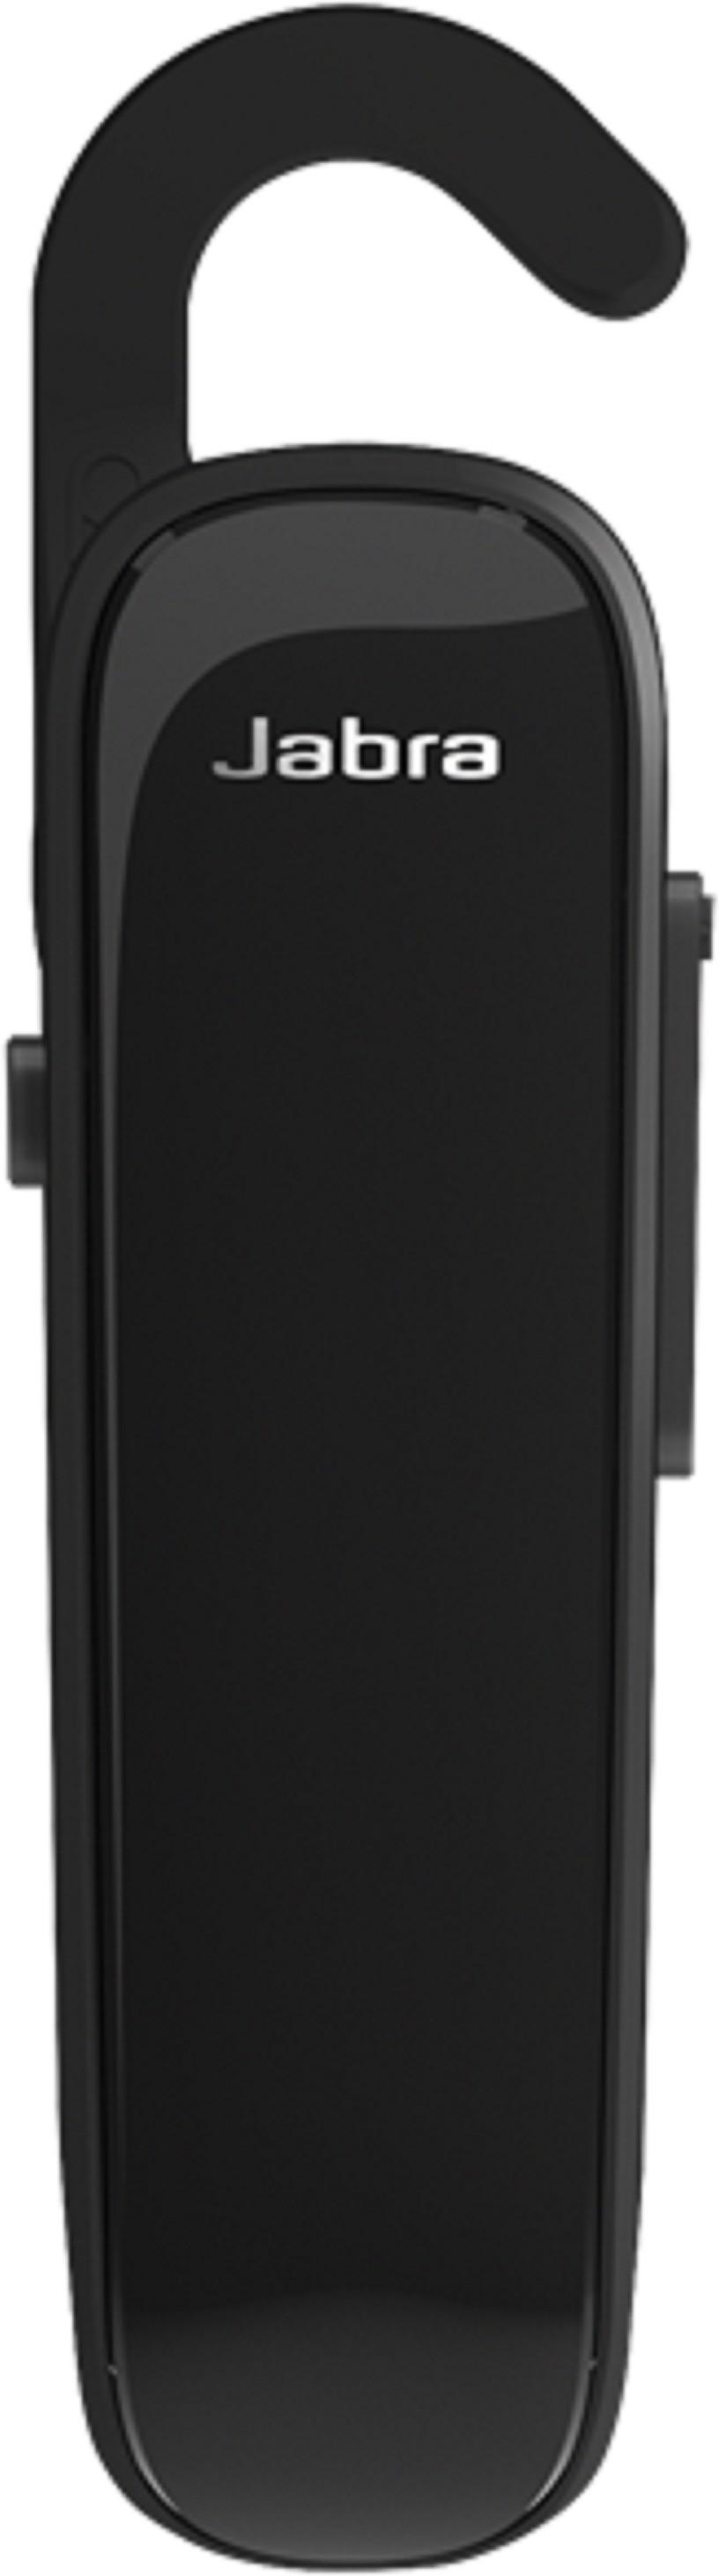 Jabra Boost Black Wireless Bluetooth Headset With Mic(Black)